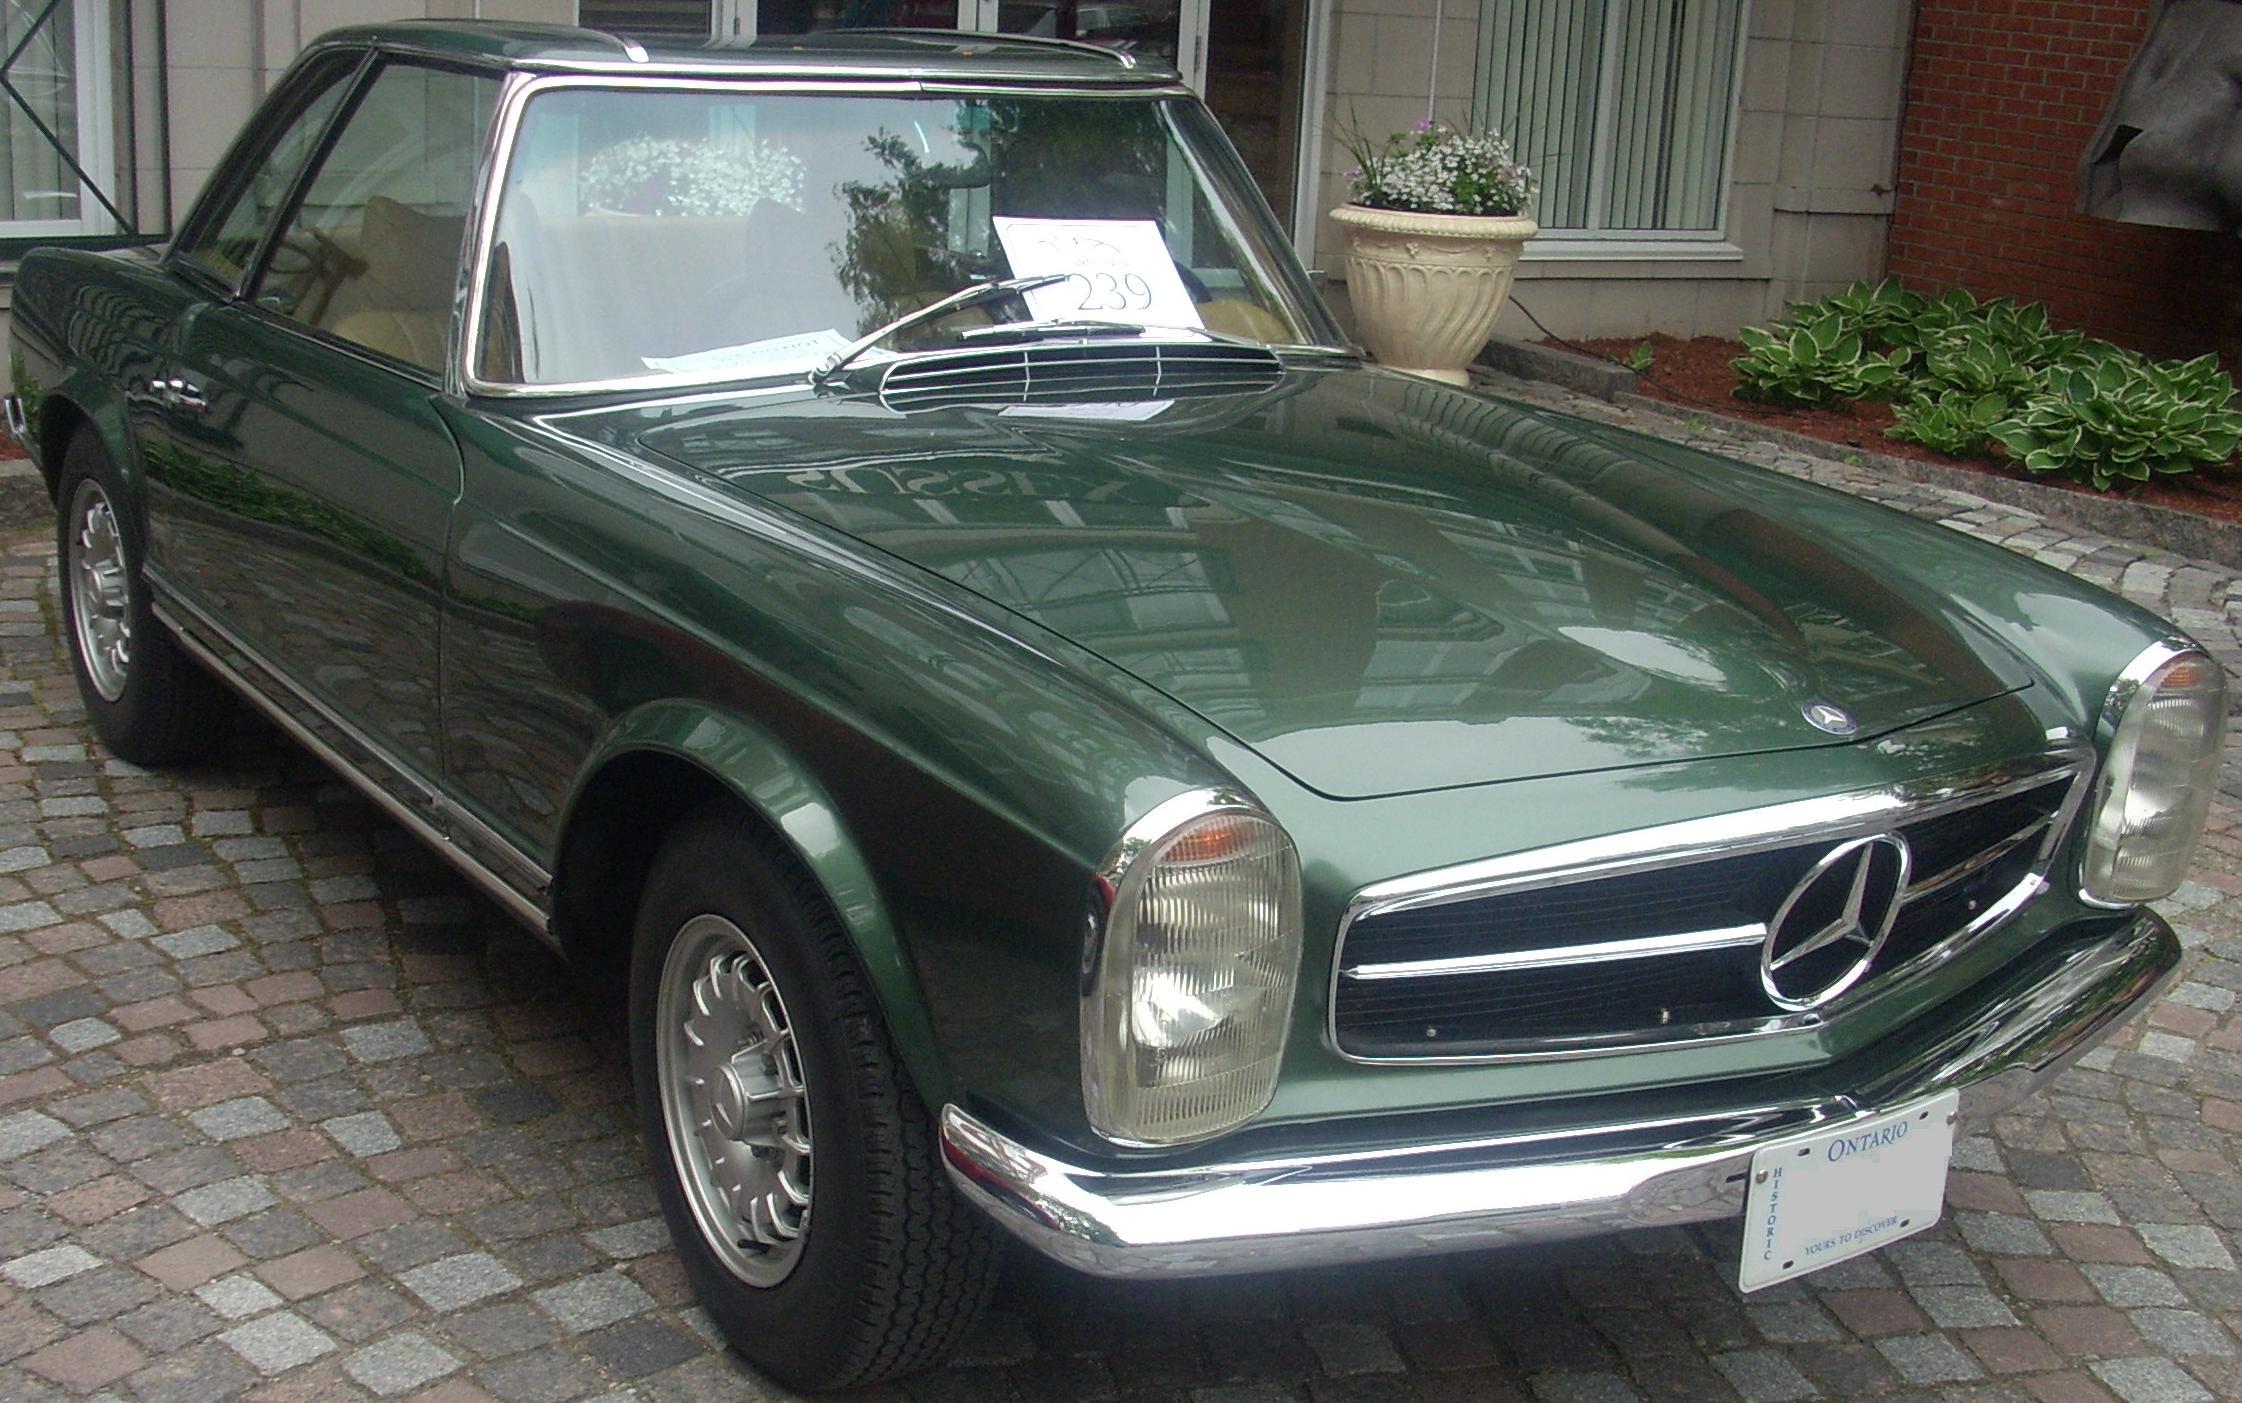 File:Mercedes-Benz W113 SL-Class (Byward Auto Classic).jpg - Wikimedia ...